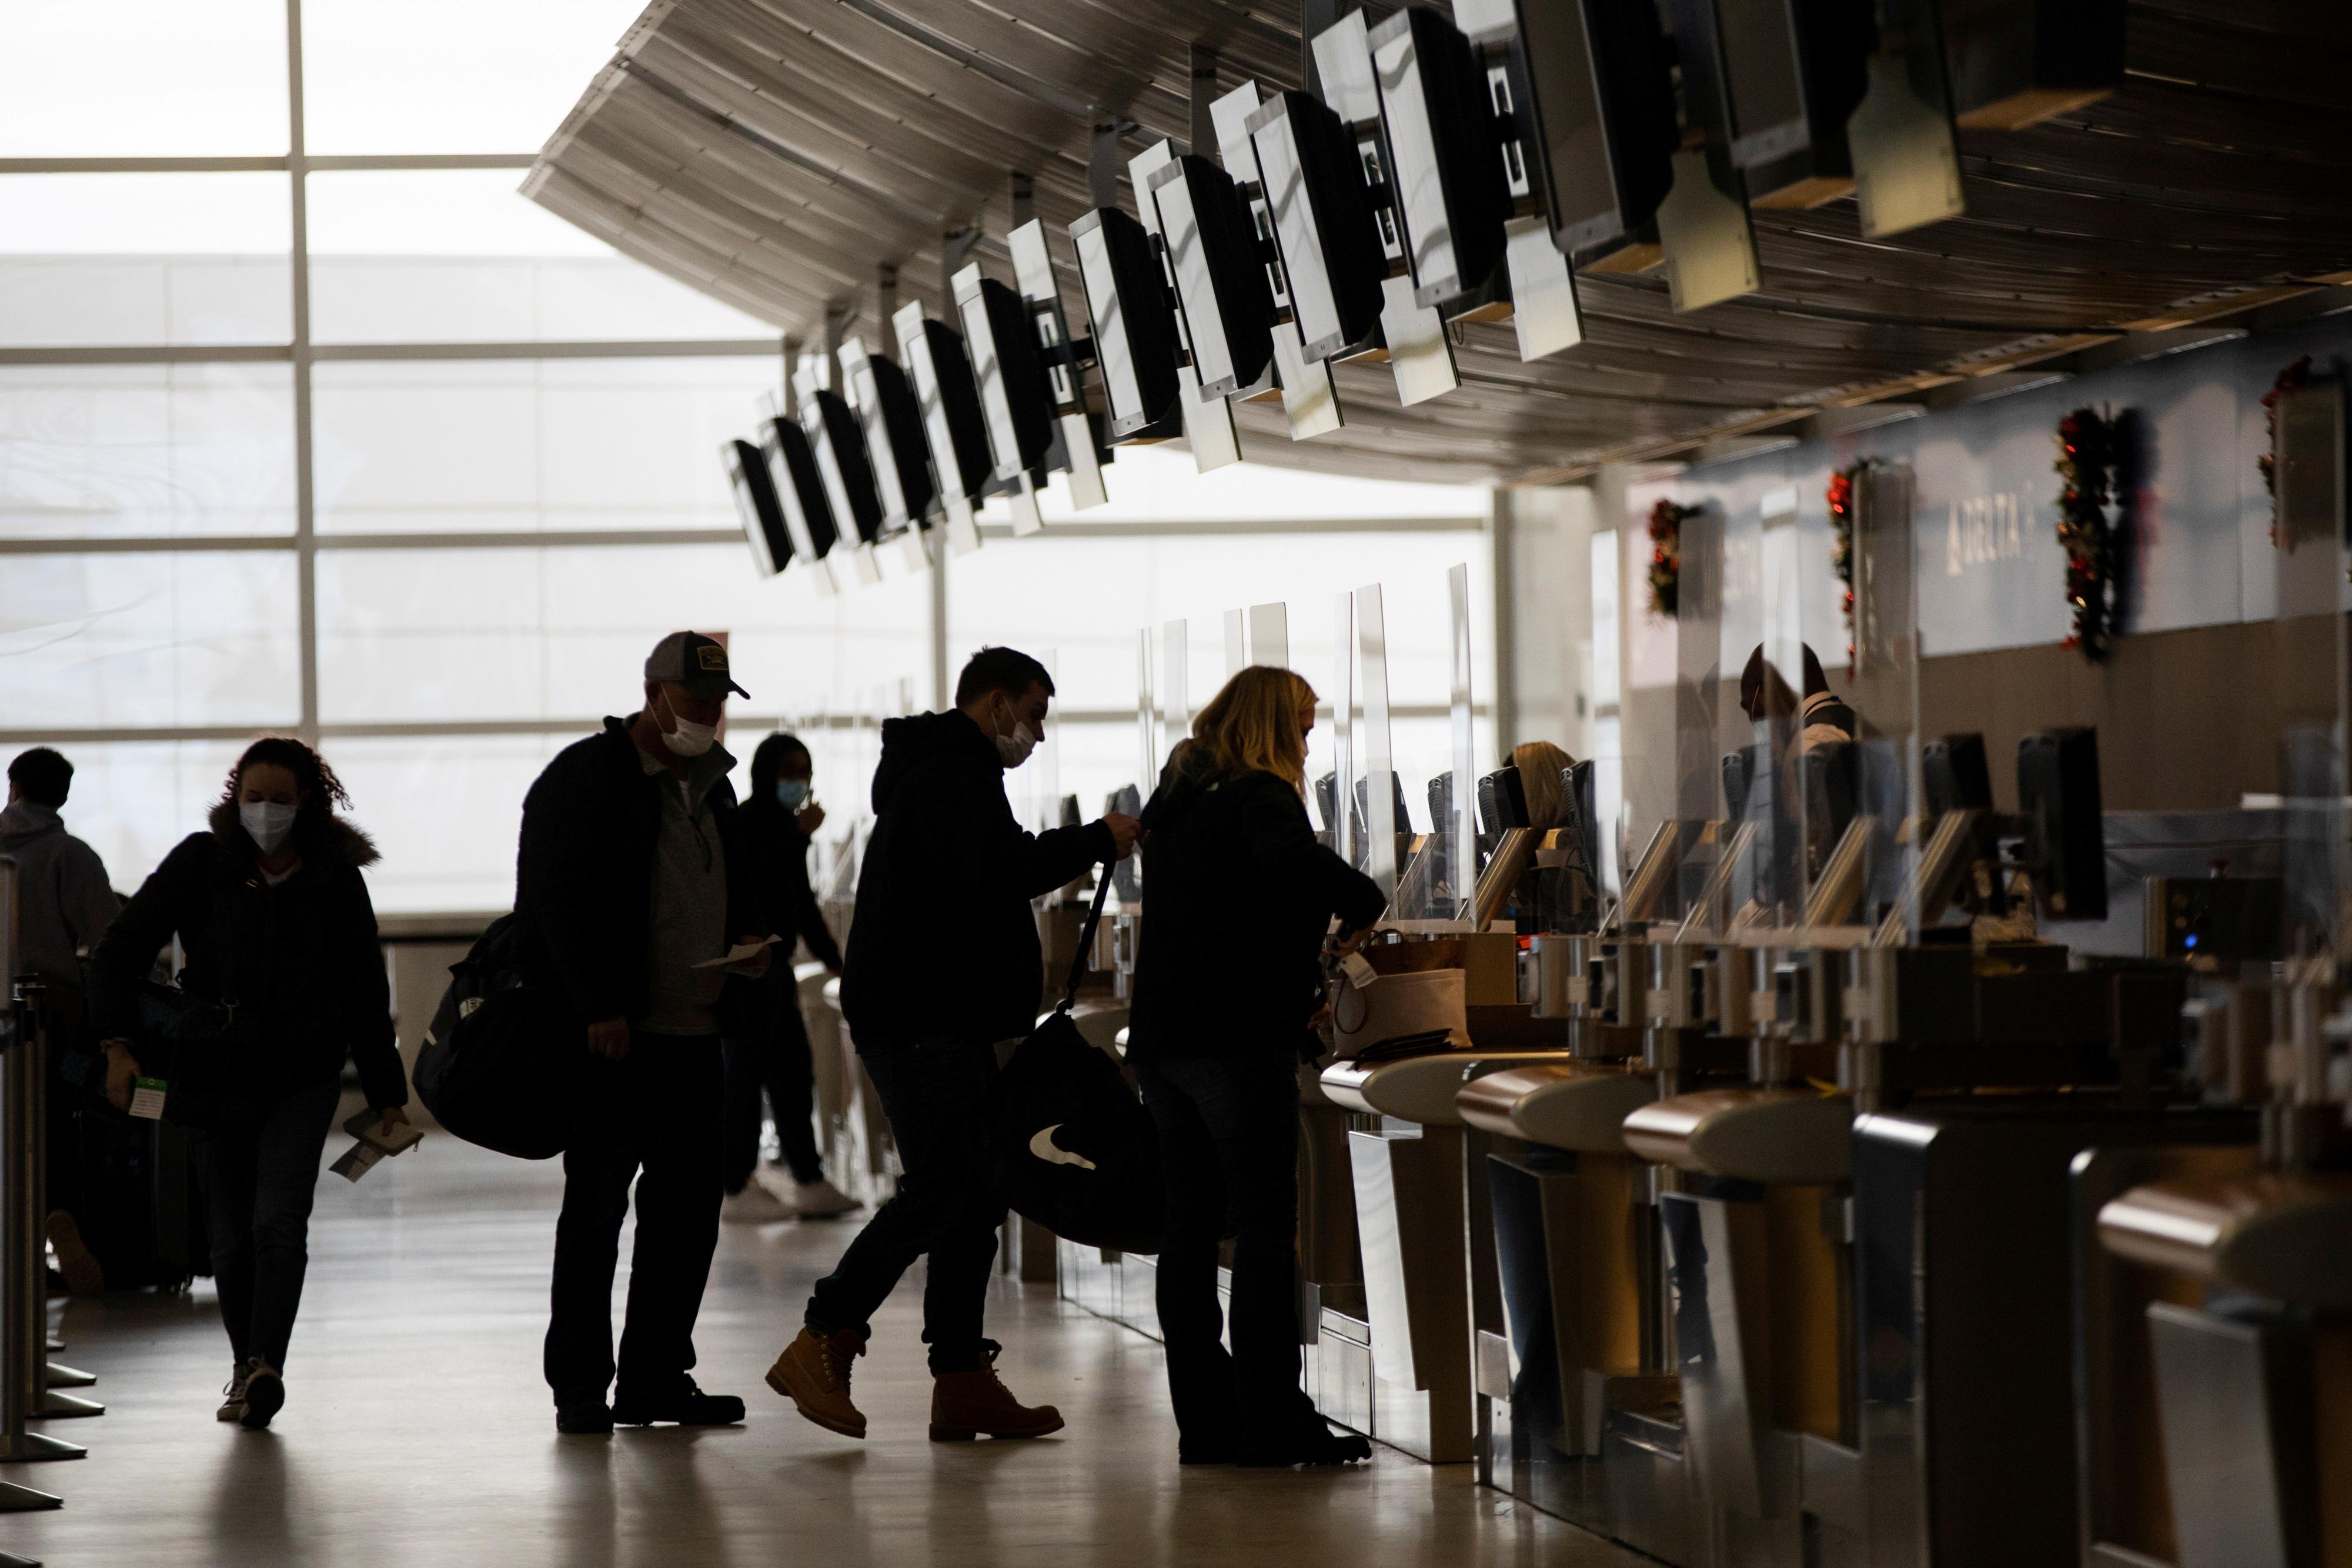 Travelers check in for their flights at Detroit Metropolitan Wayne County Airport, amid the coronavirus disease (COVID-19) pandemic, in Romulus, Michigan, U.S., December 24, 2020. REUTERS/Emily Elconin/File Photo